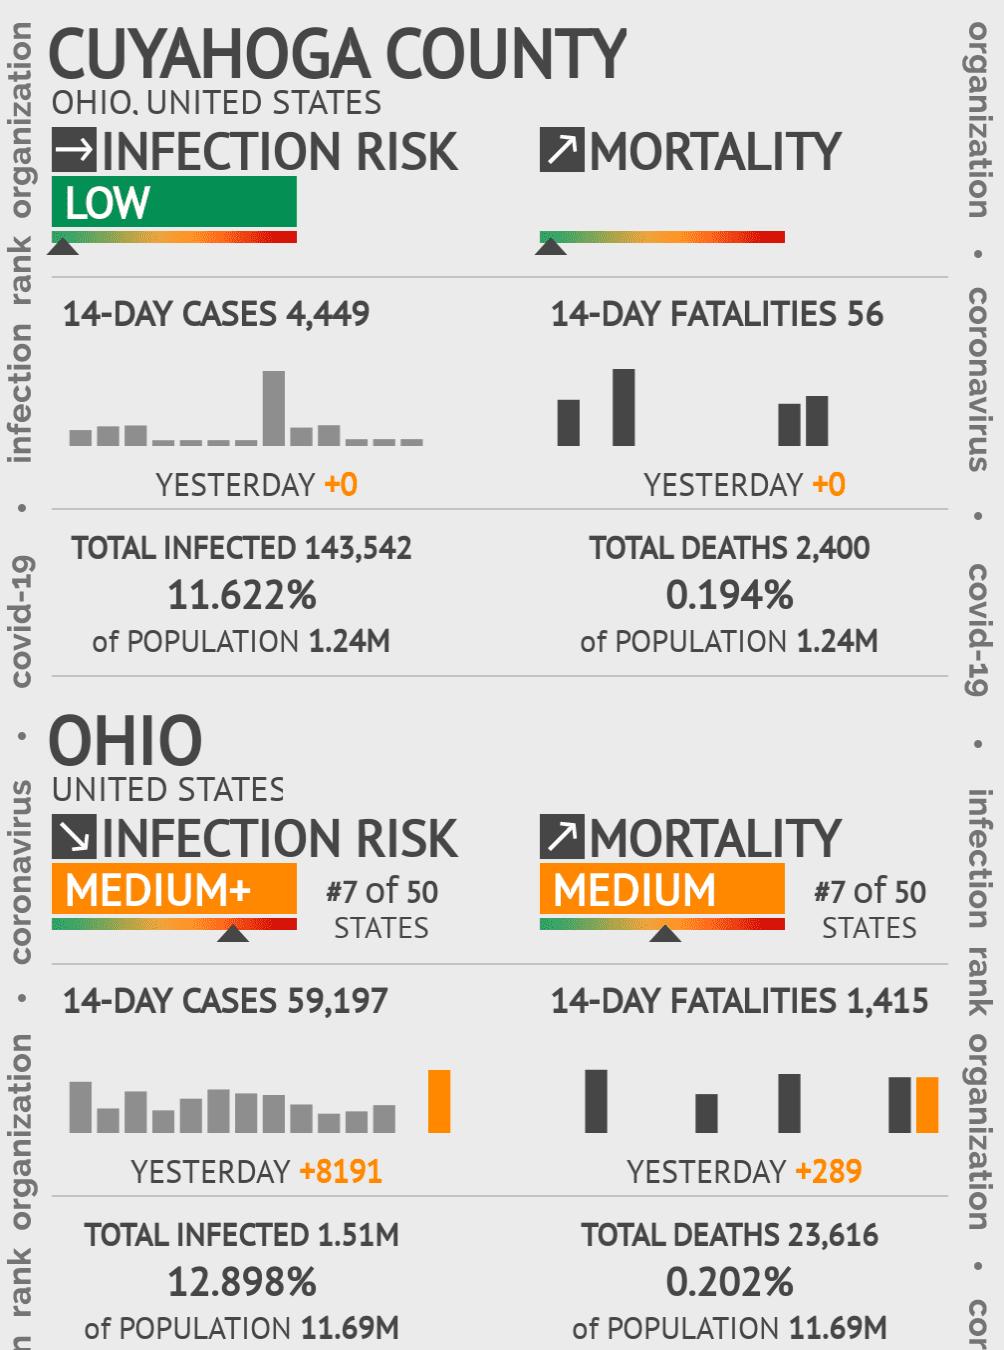 Cuyahoga County Coronavirus Covid-19 Risk of Infection on July 24, 2021